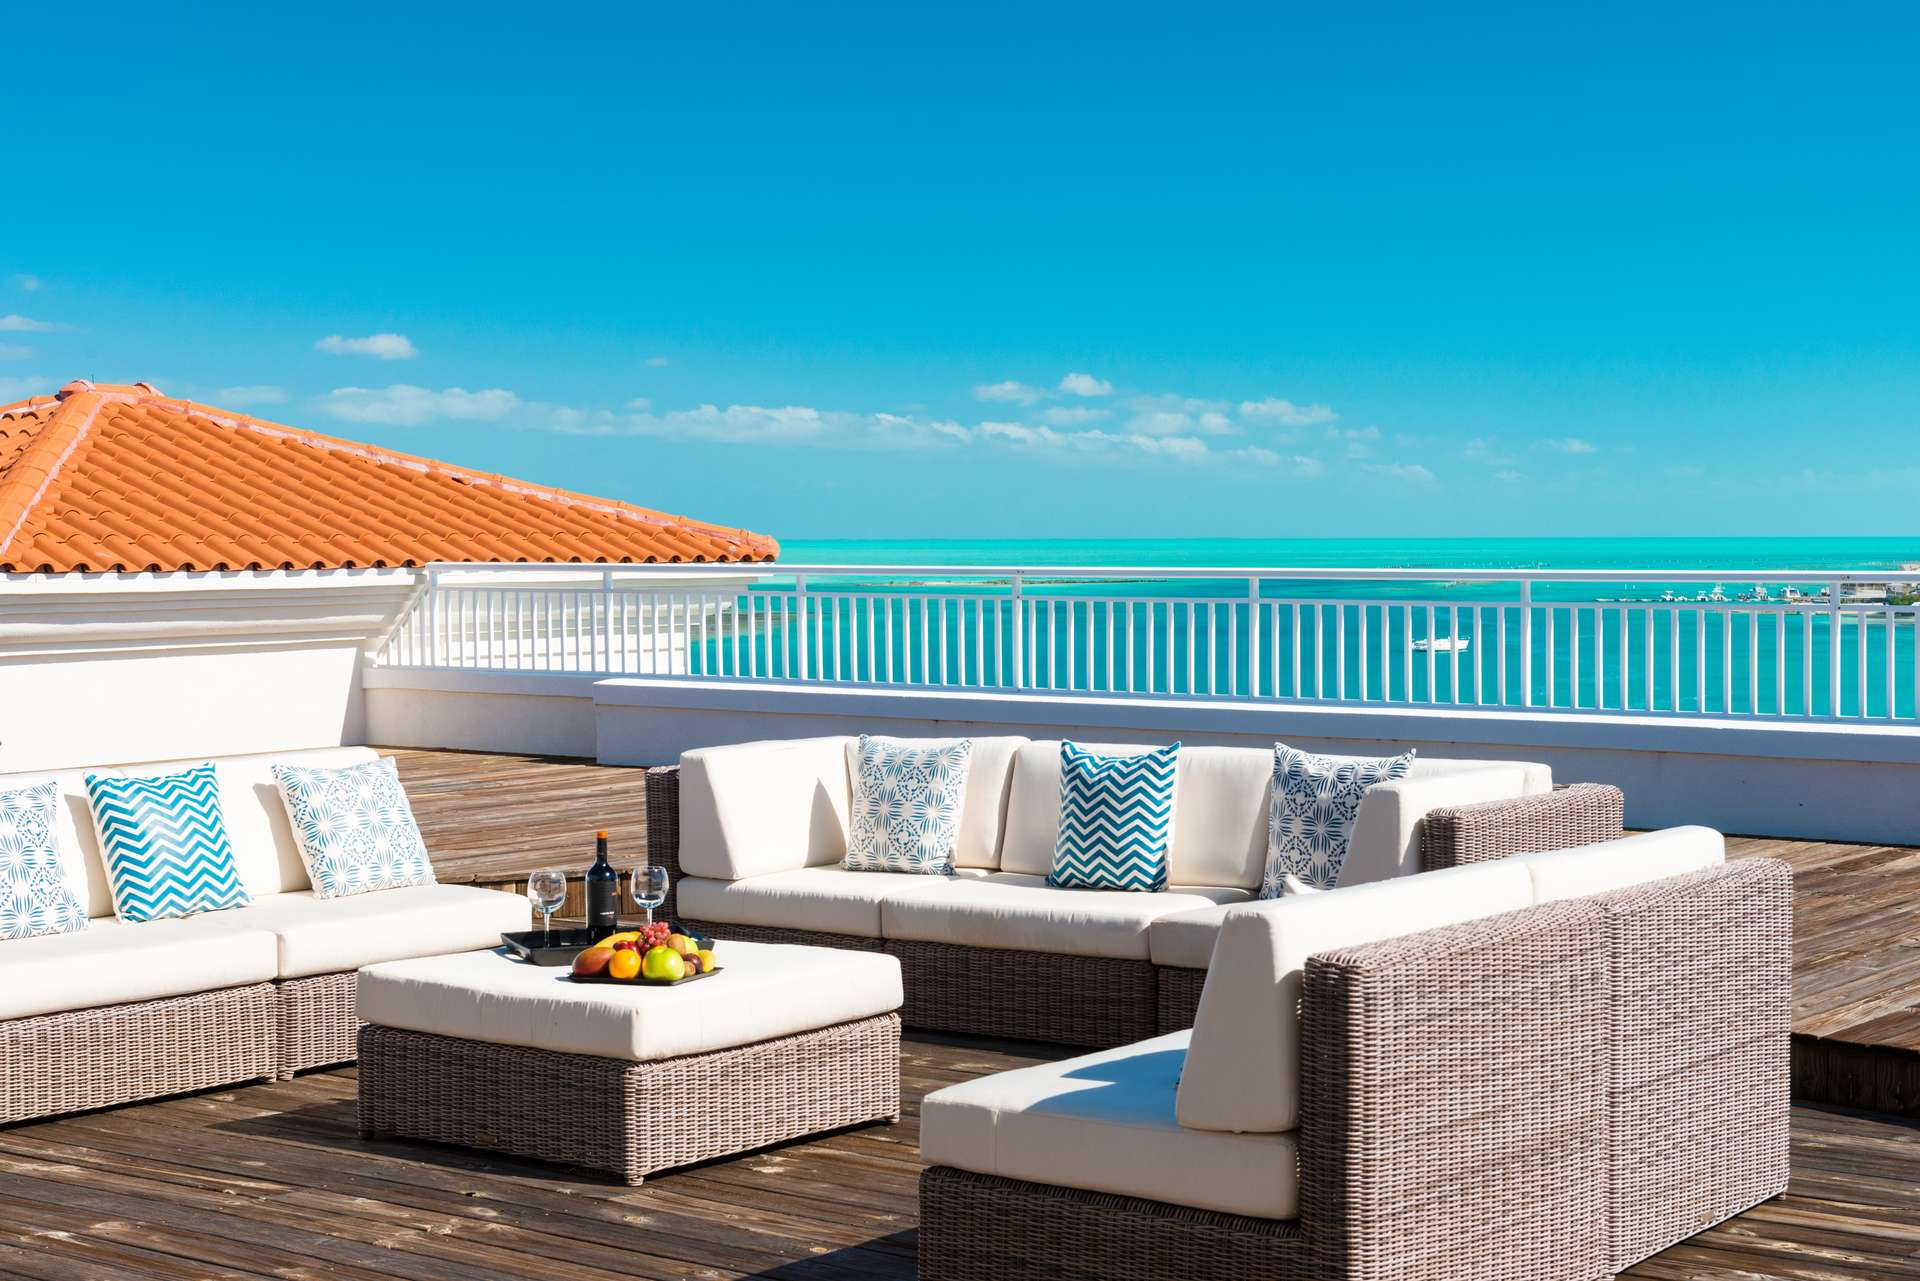 Luxury villa rentals caribbean - Turks and caicos - Providenciales - Blue haven resort - Ocean Front Penthouse | 2 Bedrooms - Image 1/7